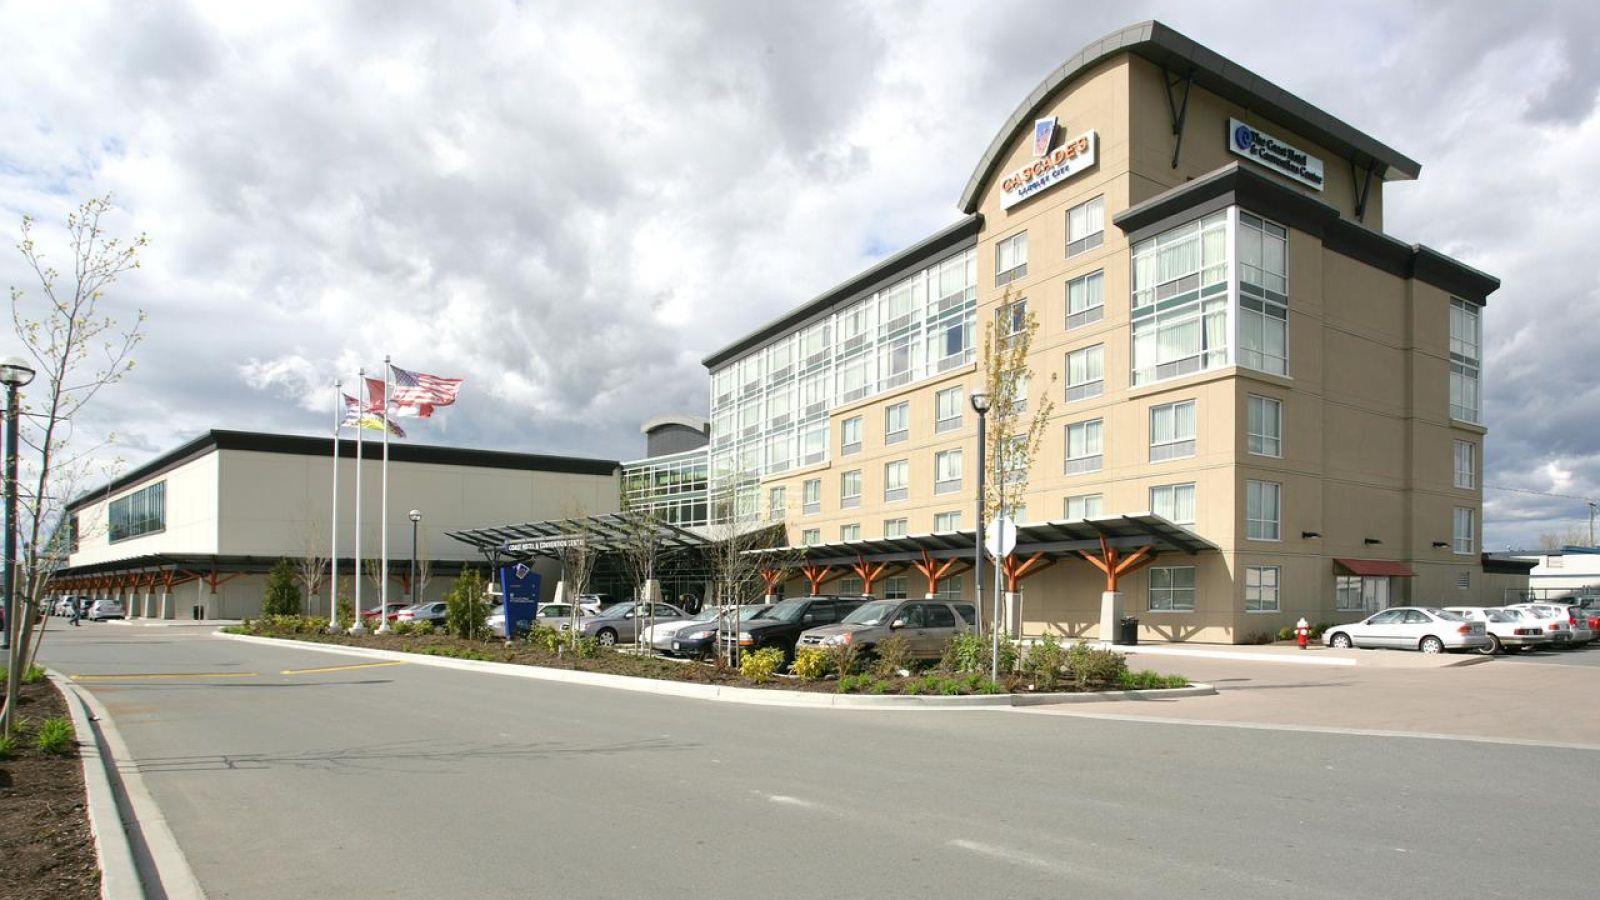 Coast Hotel & Convention Centre Langley